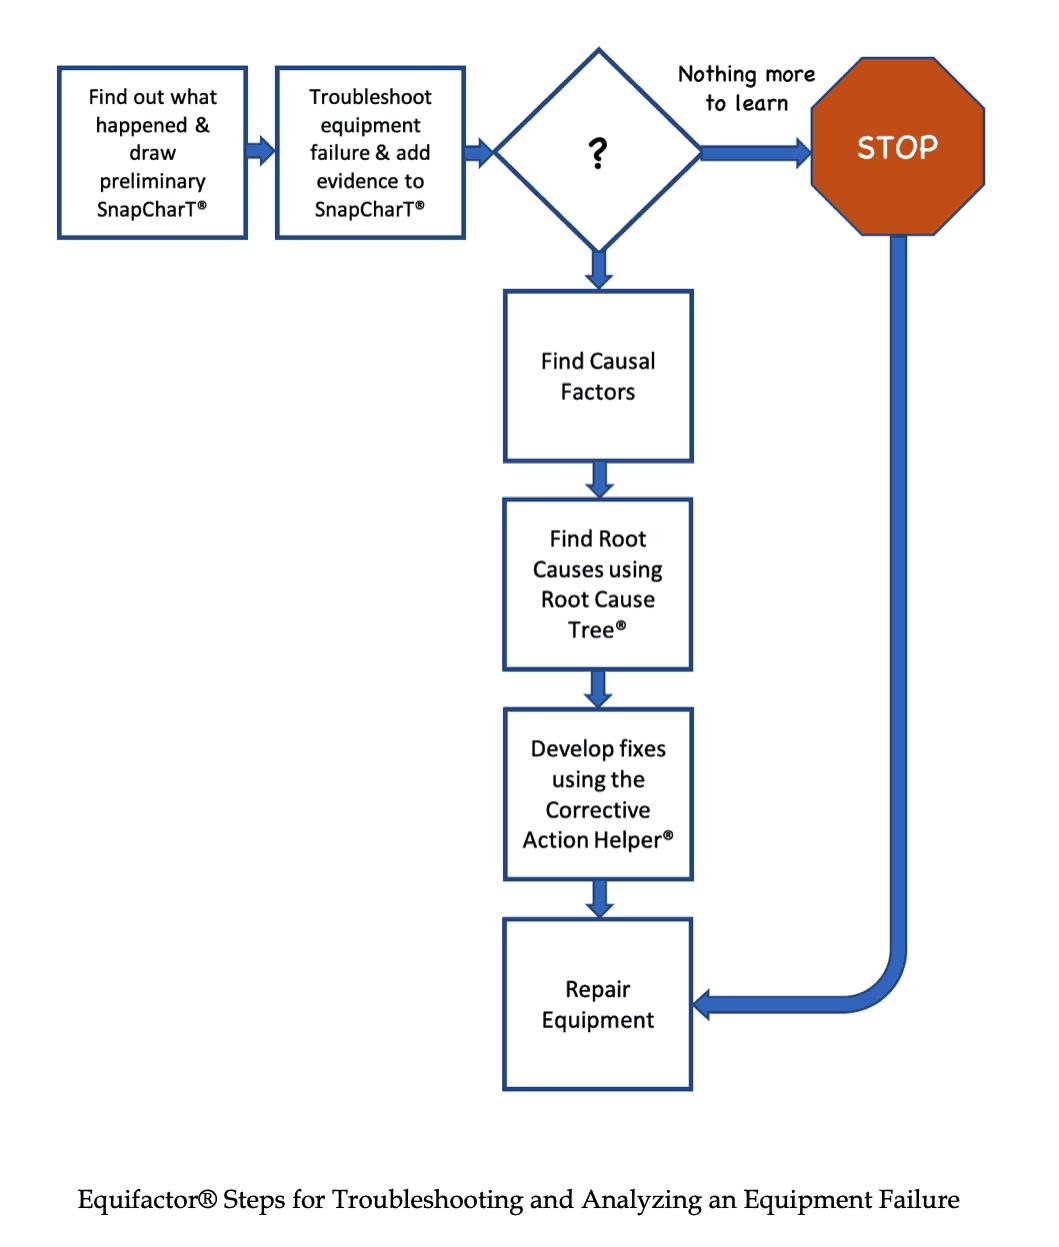 Equifactor® Process